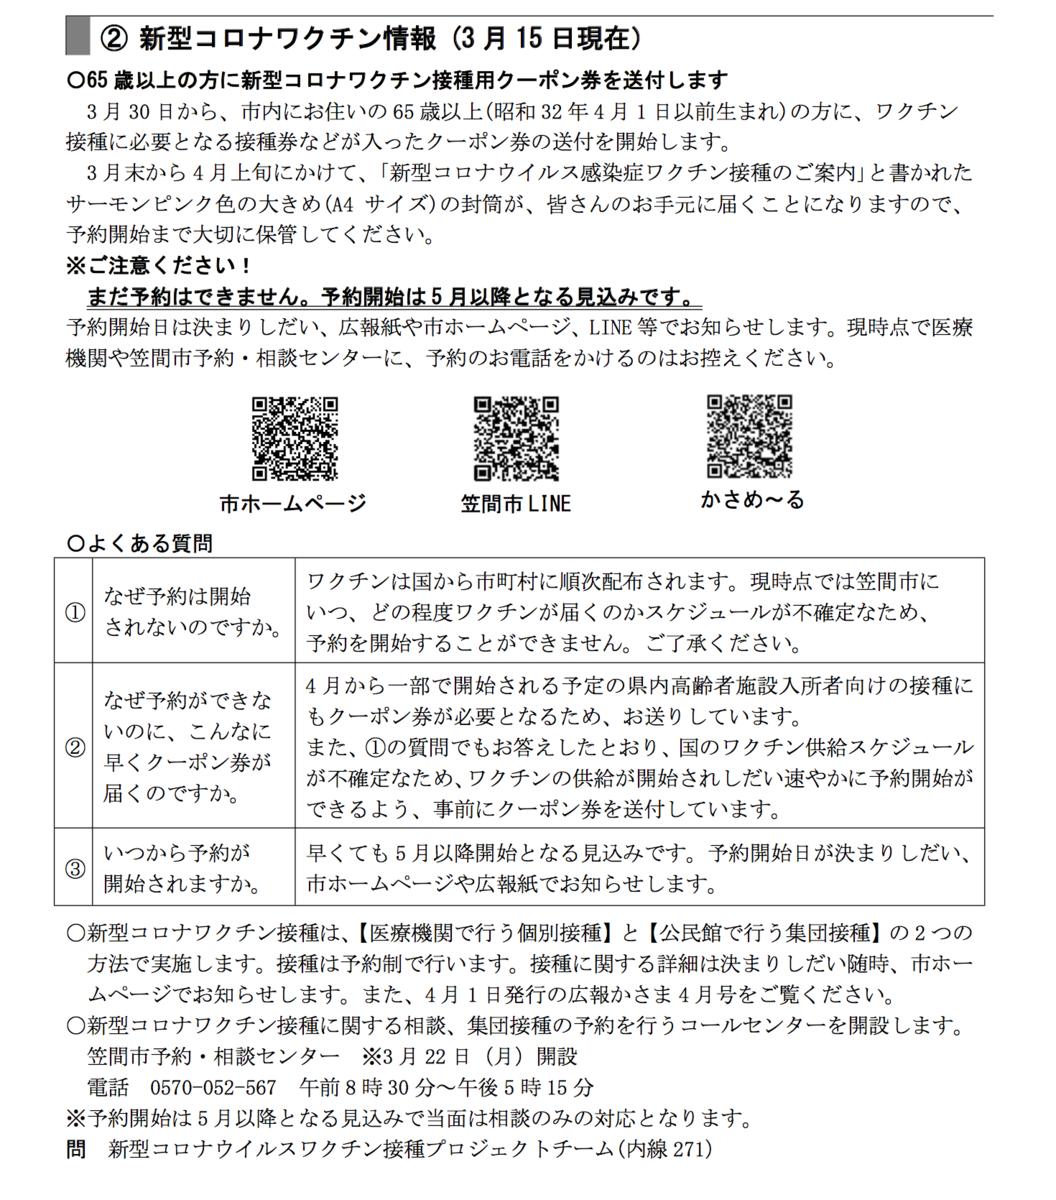 f:id:tomochan0113:20210401102856p:plain